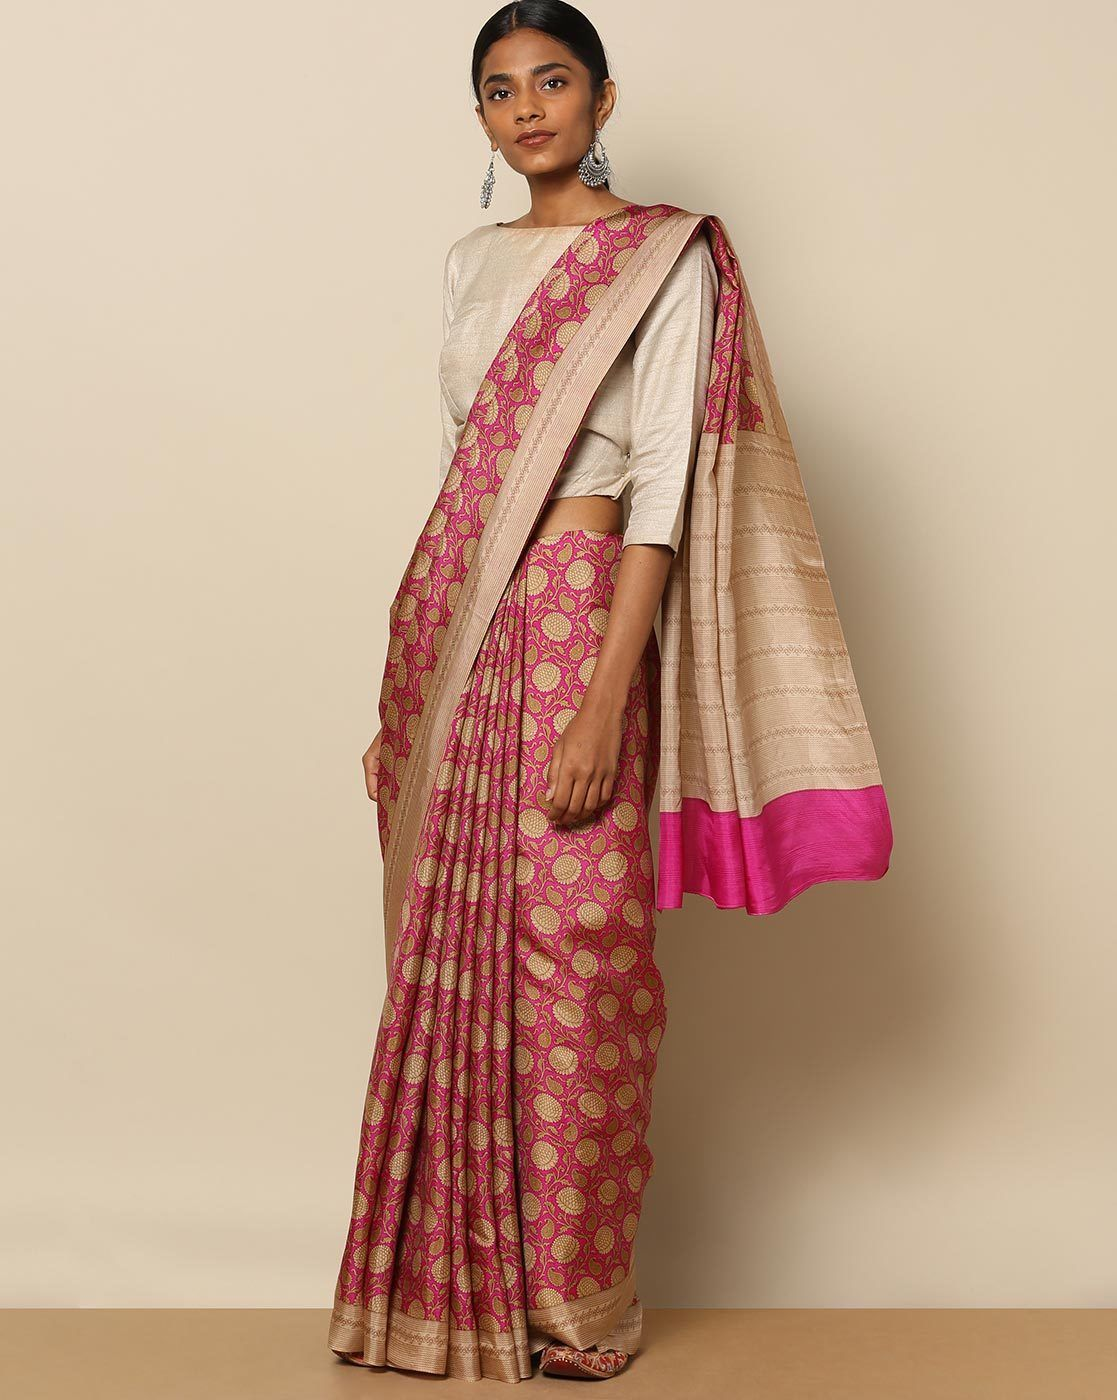 086229bead Buy Rudrakaashe-MSU Women Multicoloured Soft Pure Silk Floral Jaal Print  Saree   AJIO